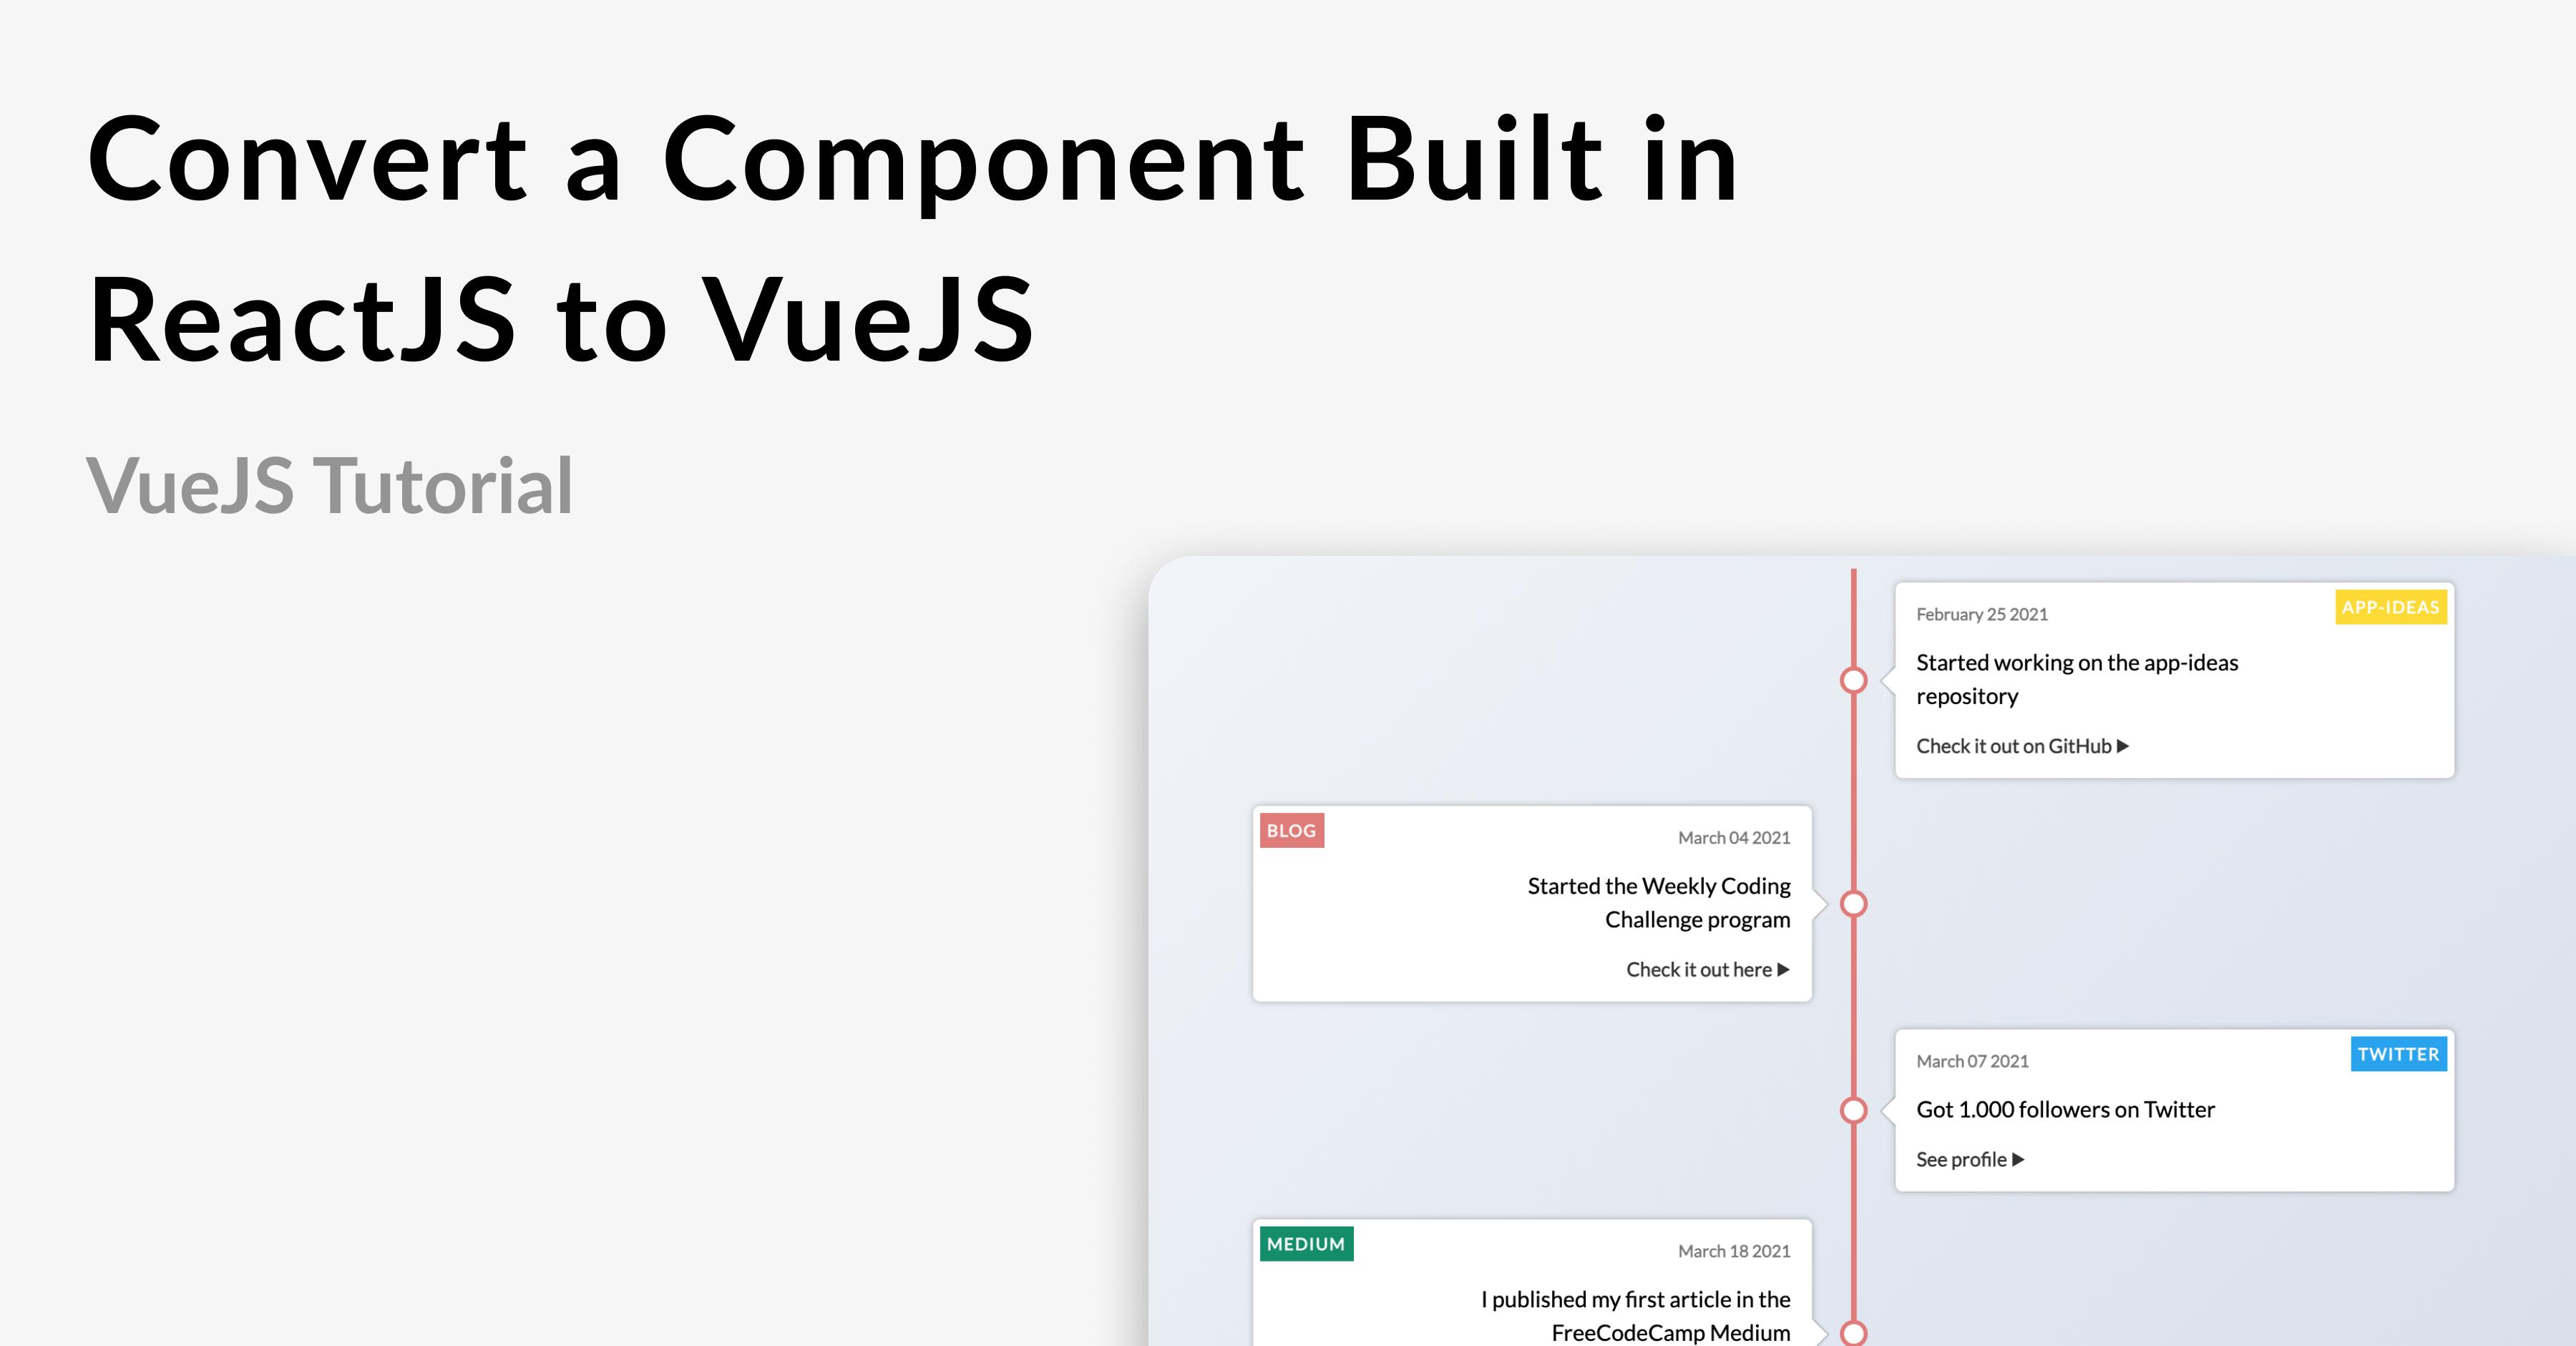 Meta image stating Convert a Component Built in ReactJS to VueJS alongside Timeline component